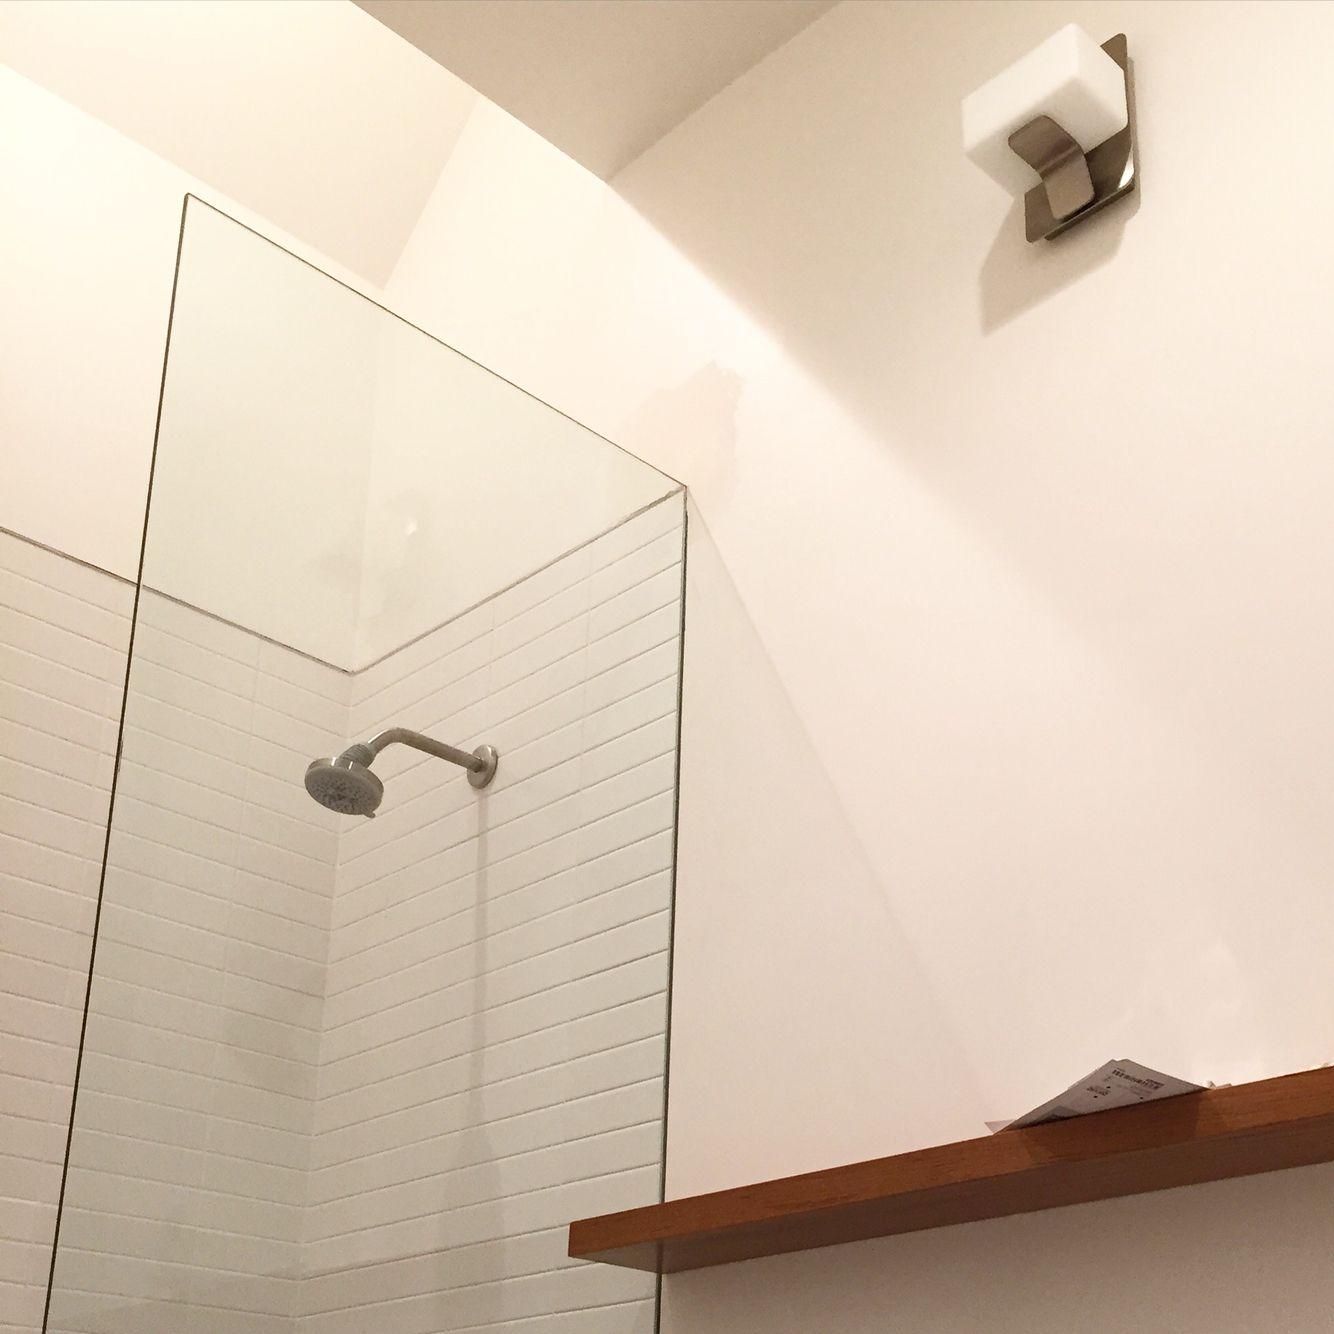 Cole Valley San Francisco Ca Small Bathroom Remodel Small